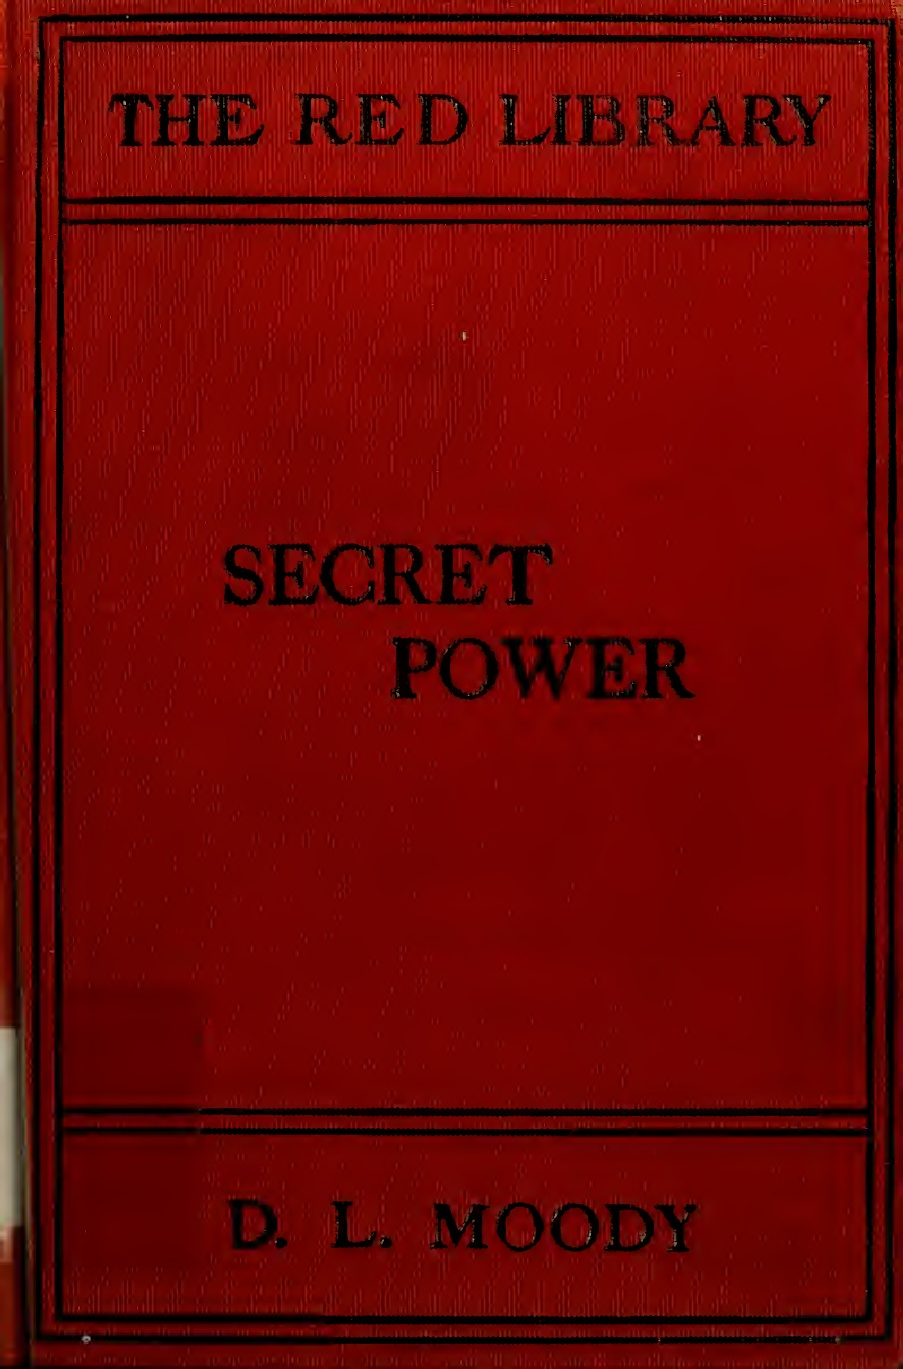 D. L. Moody-Secret Power-